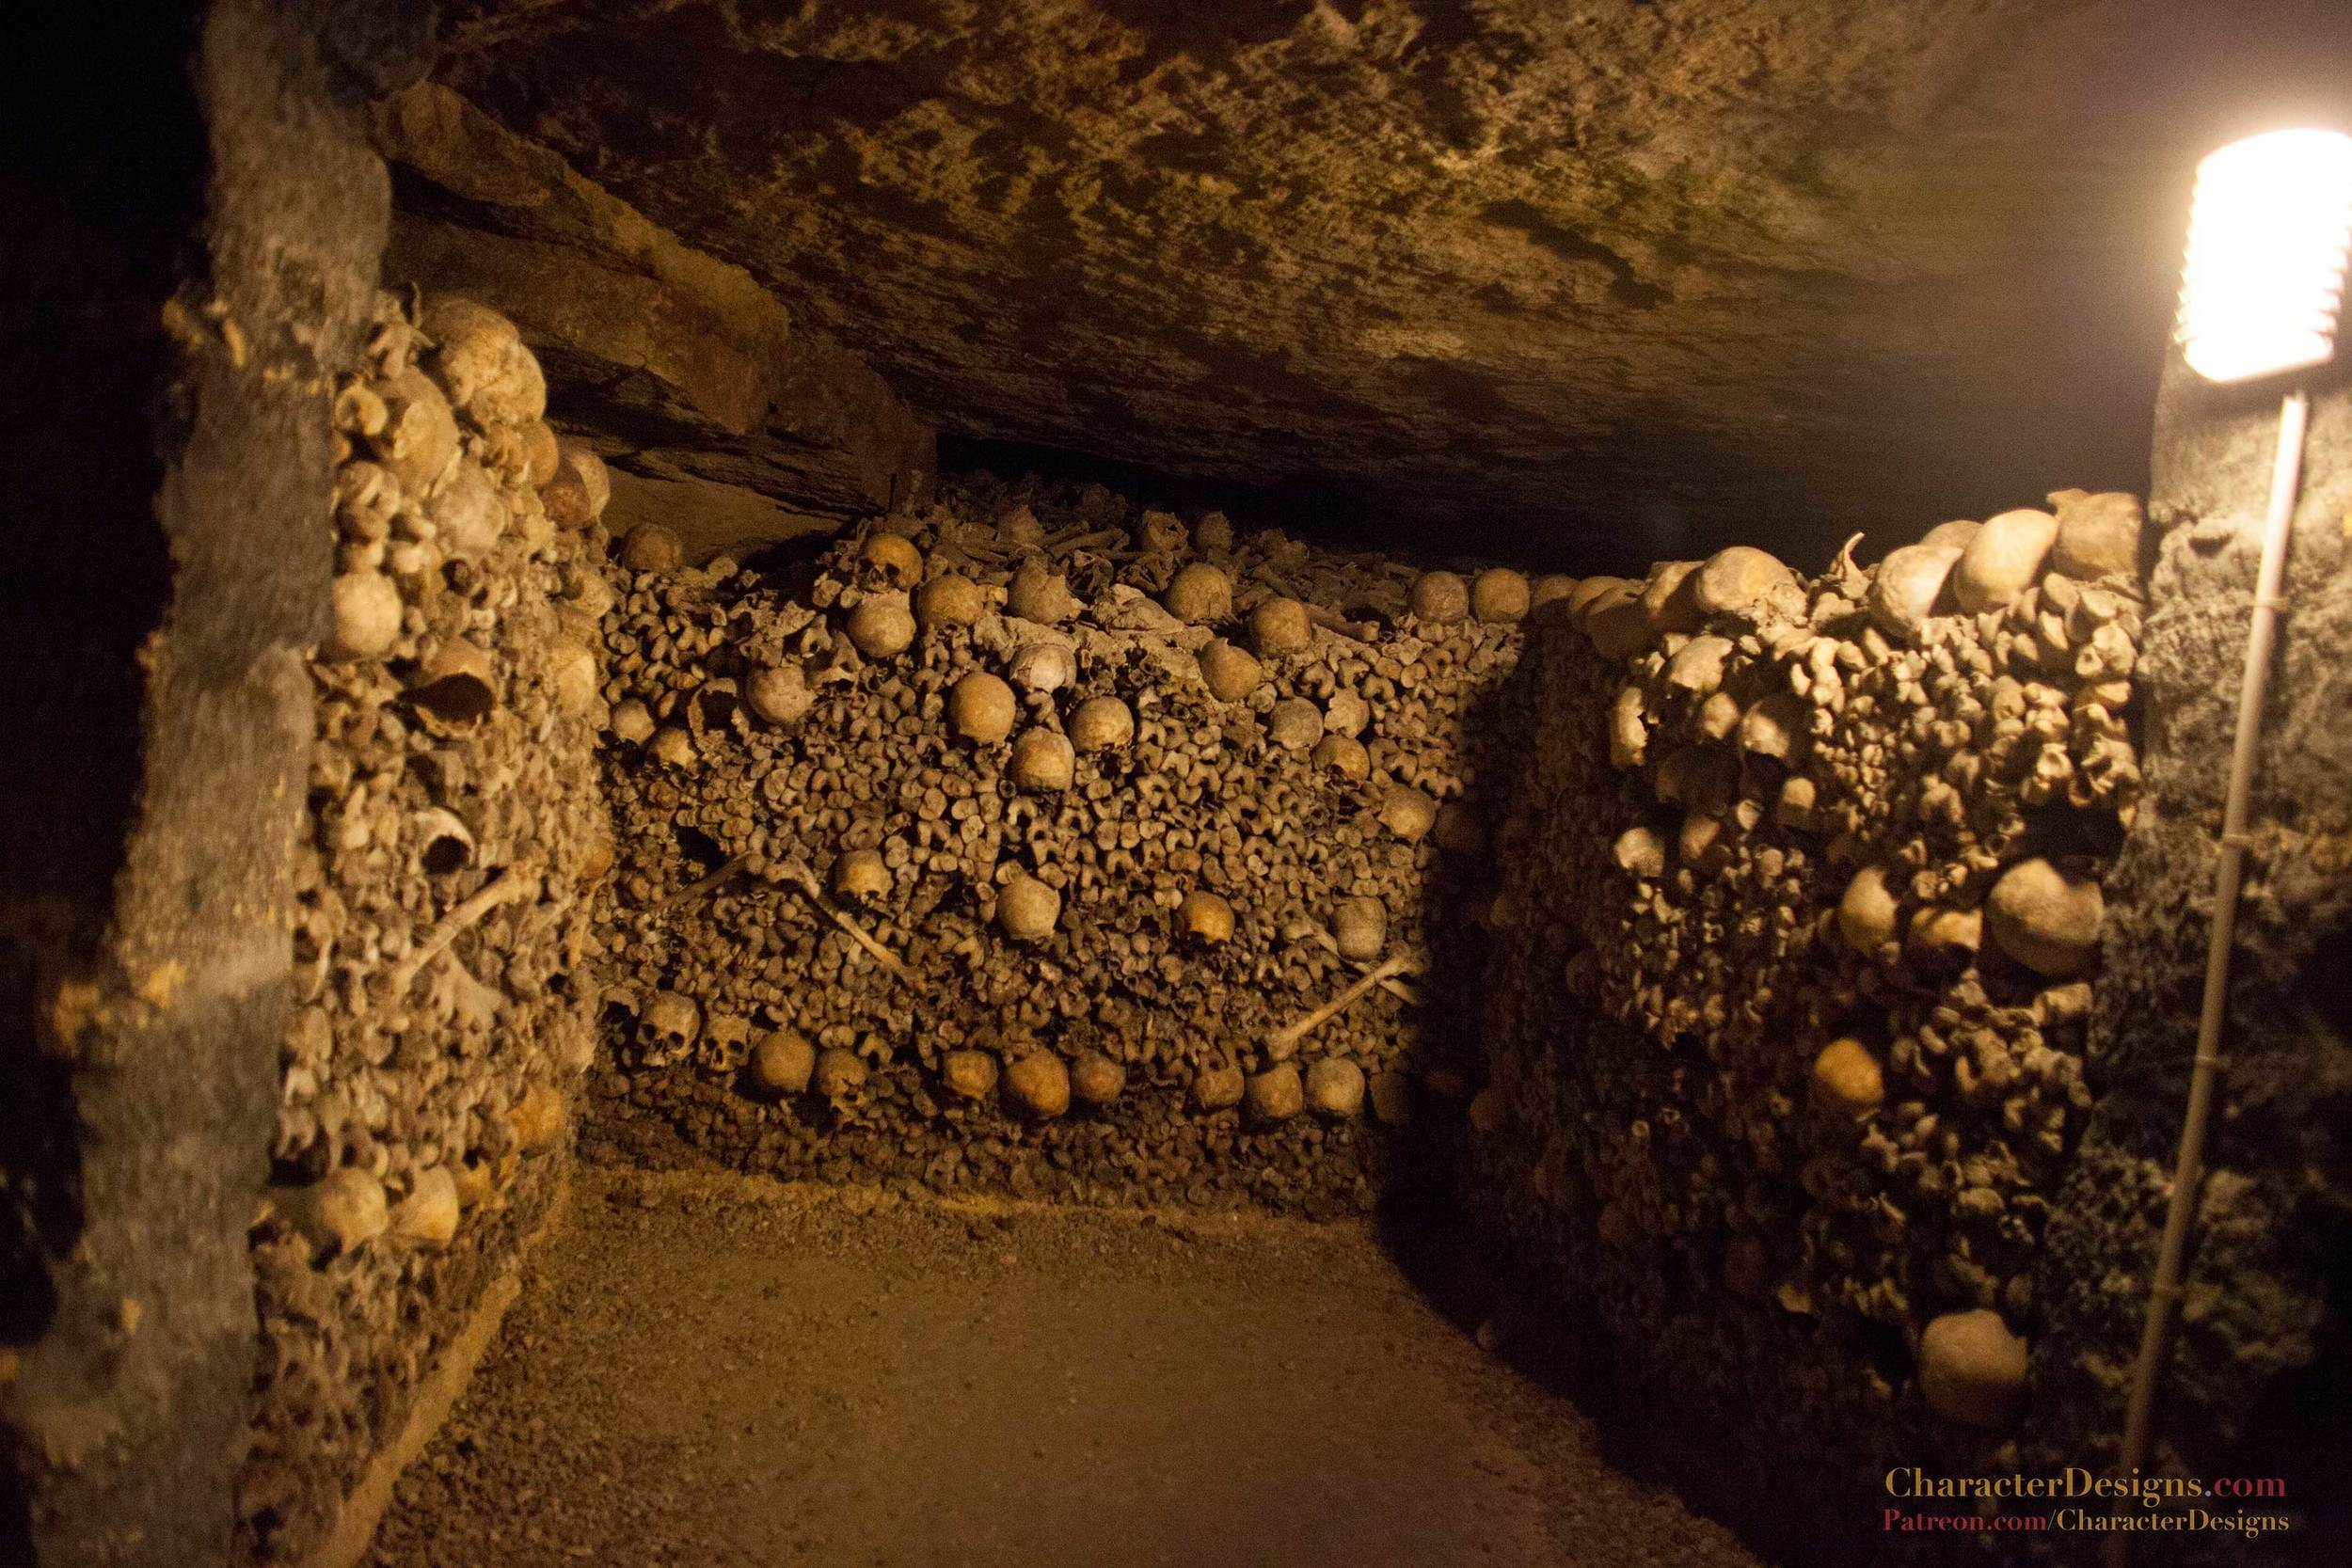 Catacombs_014.jpg